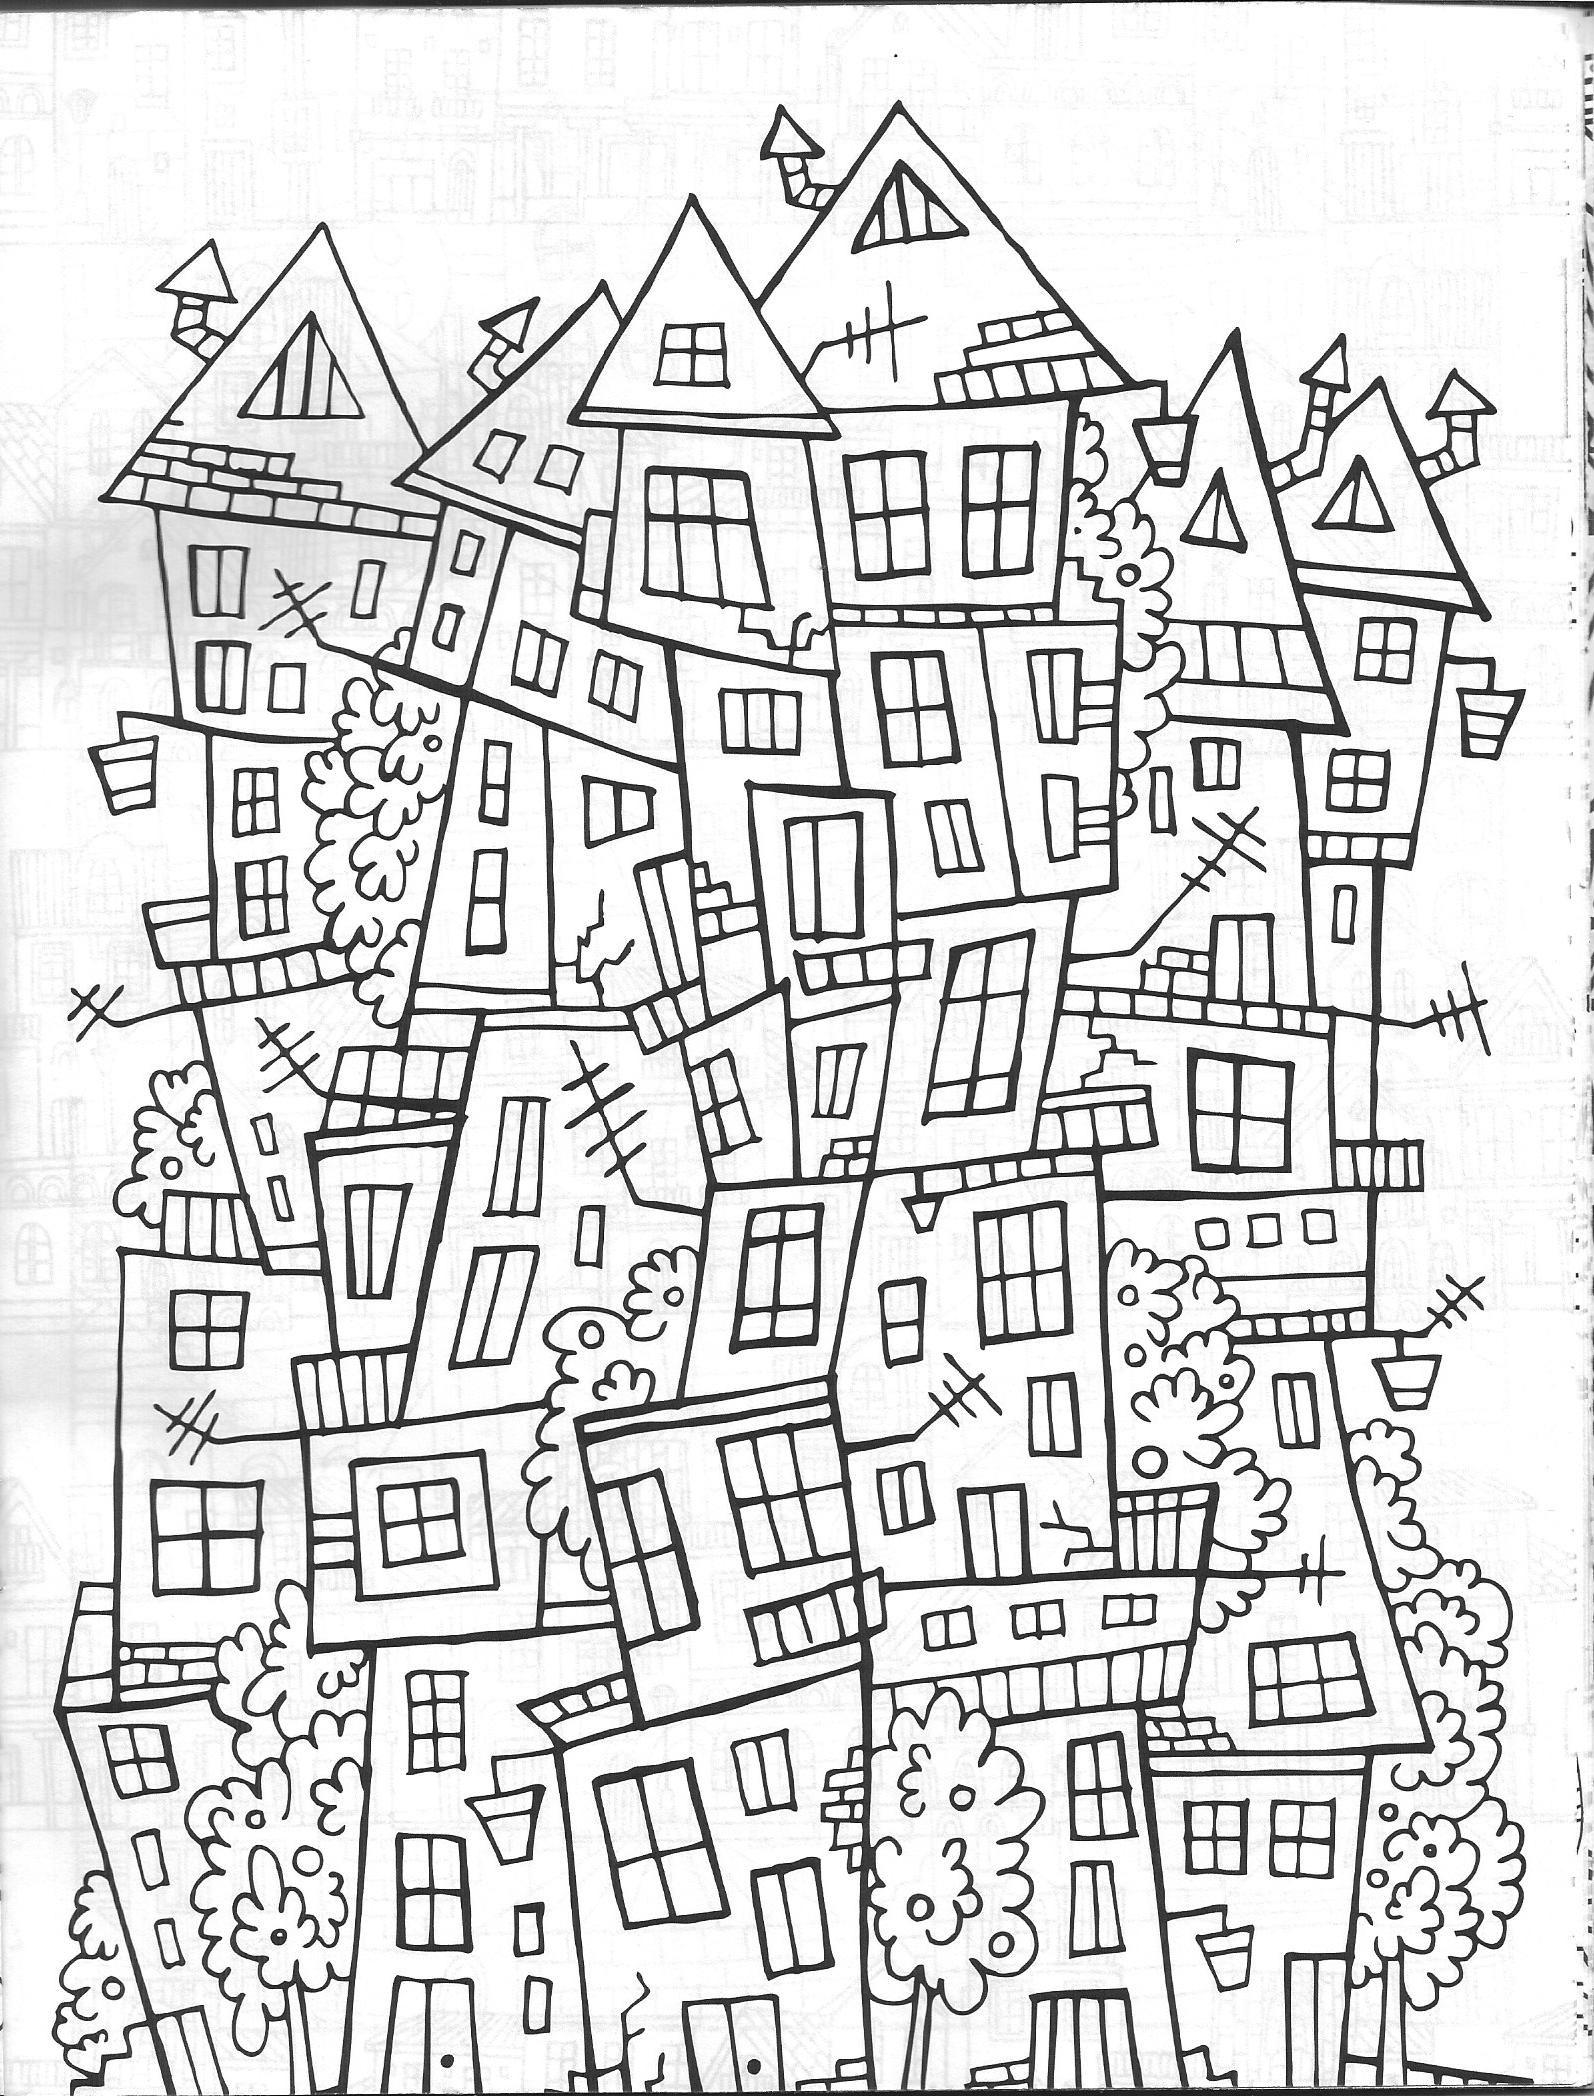 Vida Simples Cidade Dos Sonhos Boyama Kitaplari Cizimler